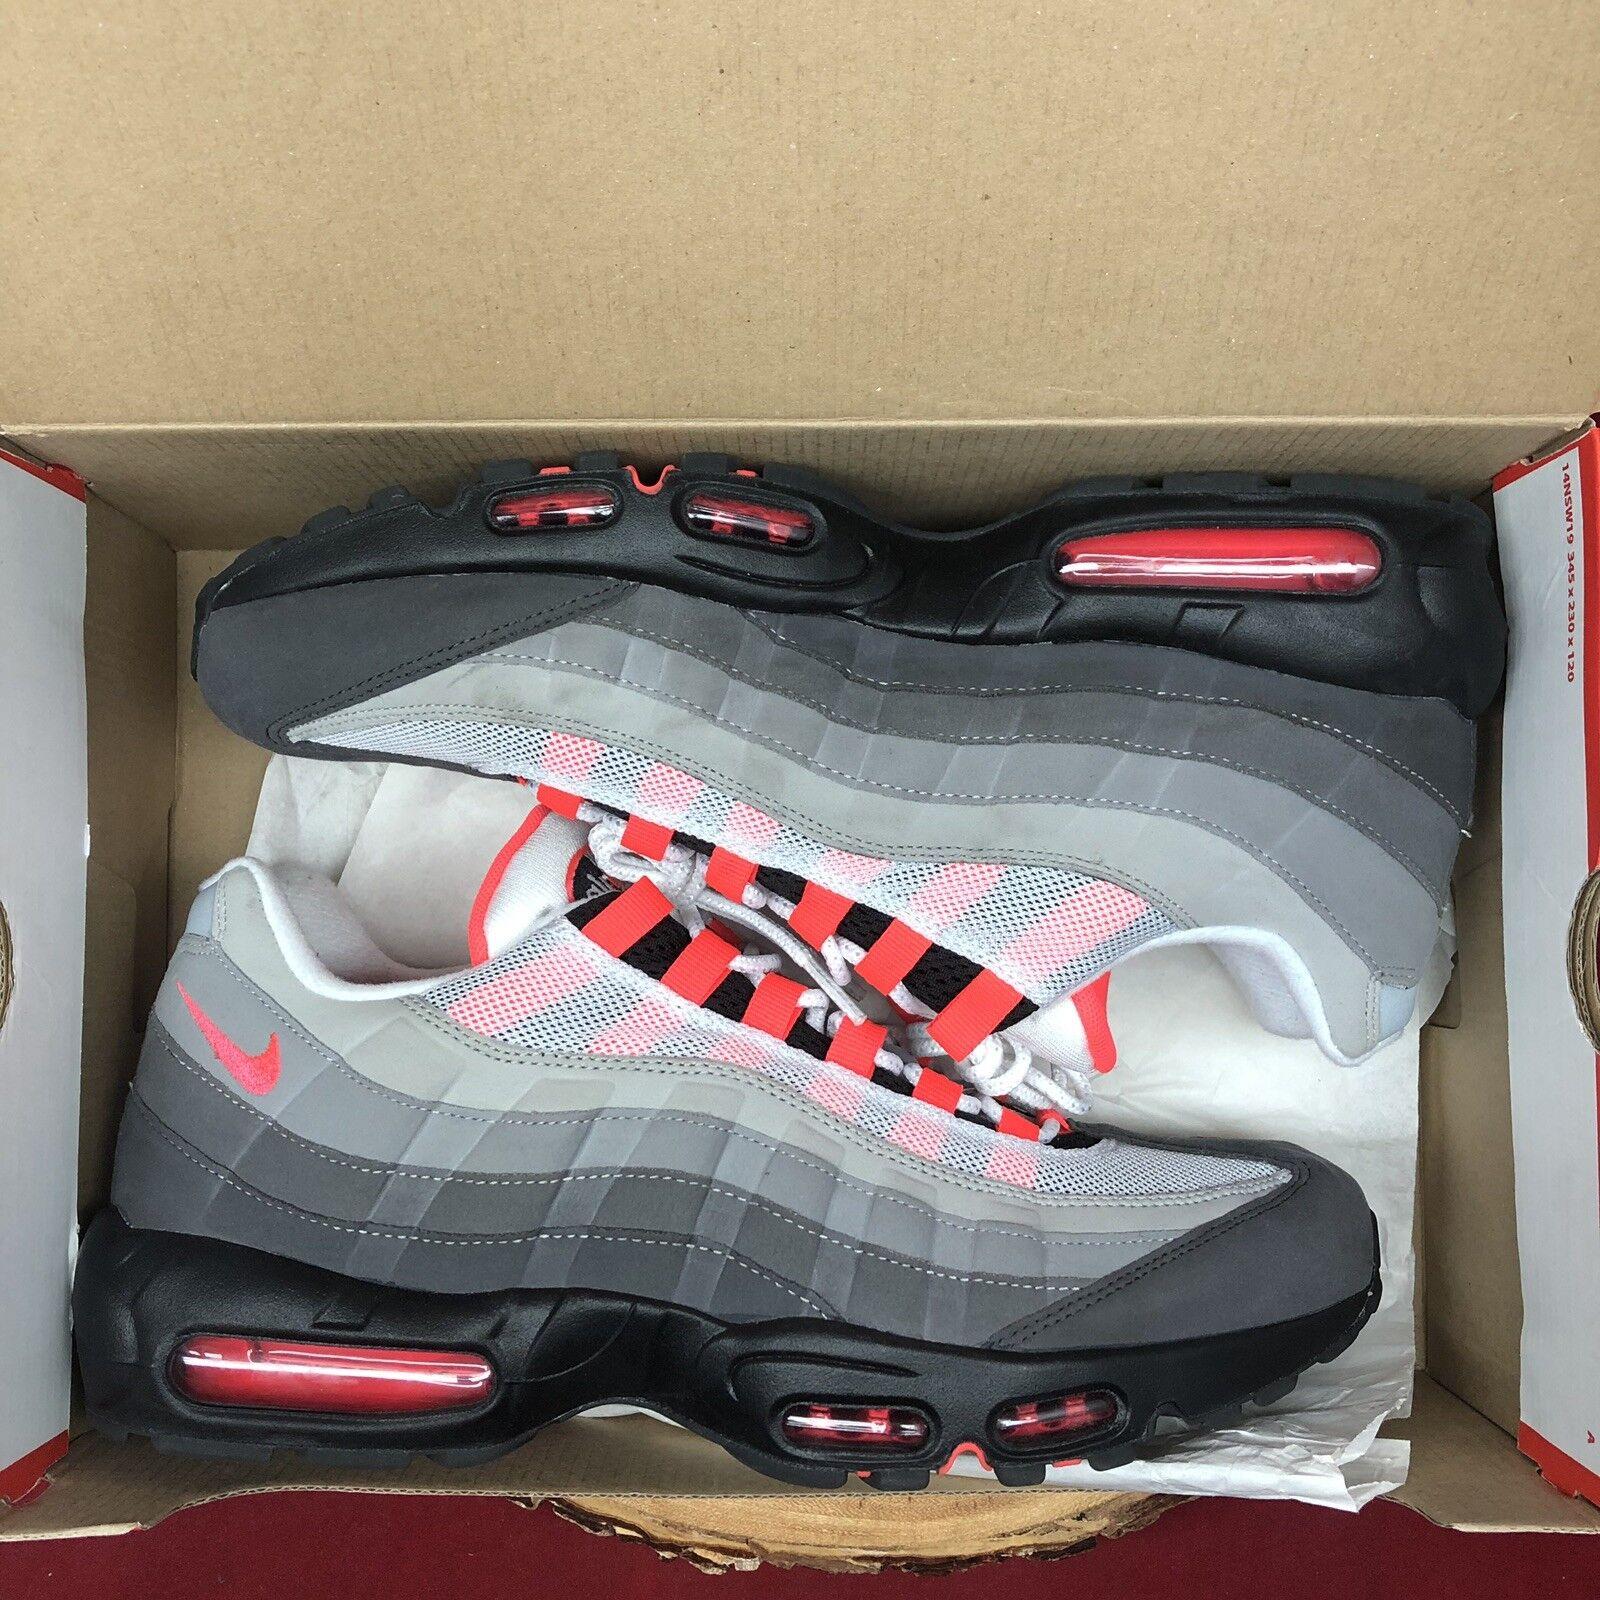 Nike Air Max 95 Solar Red Cool Dust Grey Size 12 AT2865 100 Elite 97 98 Jordan 2